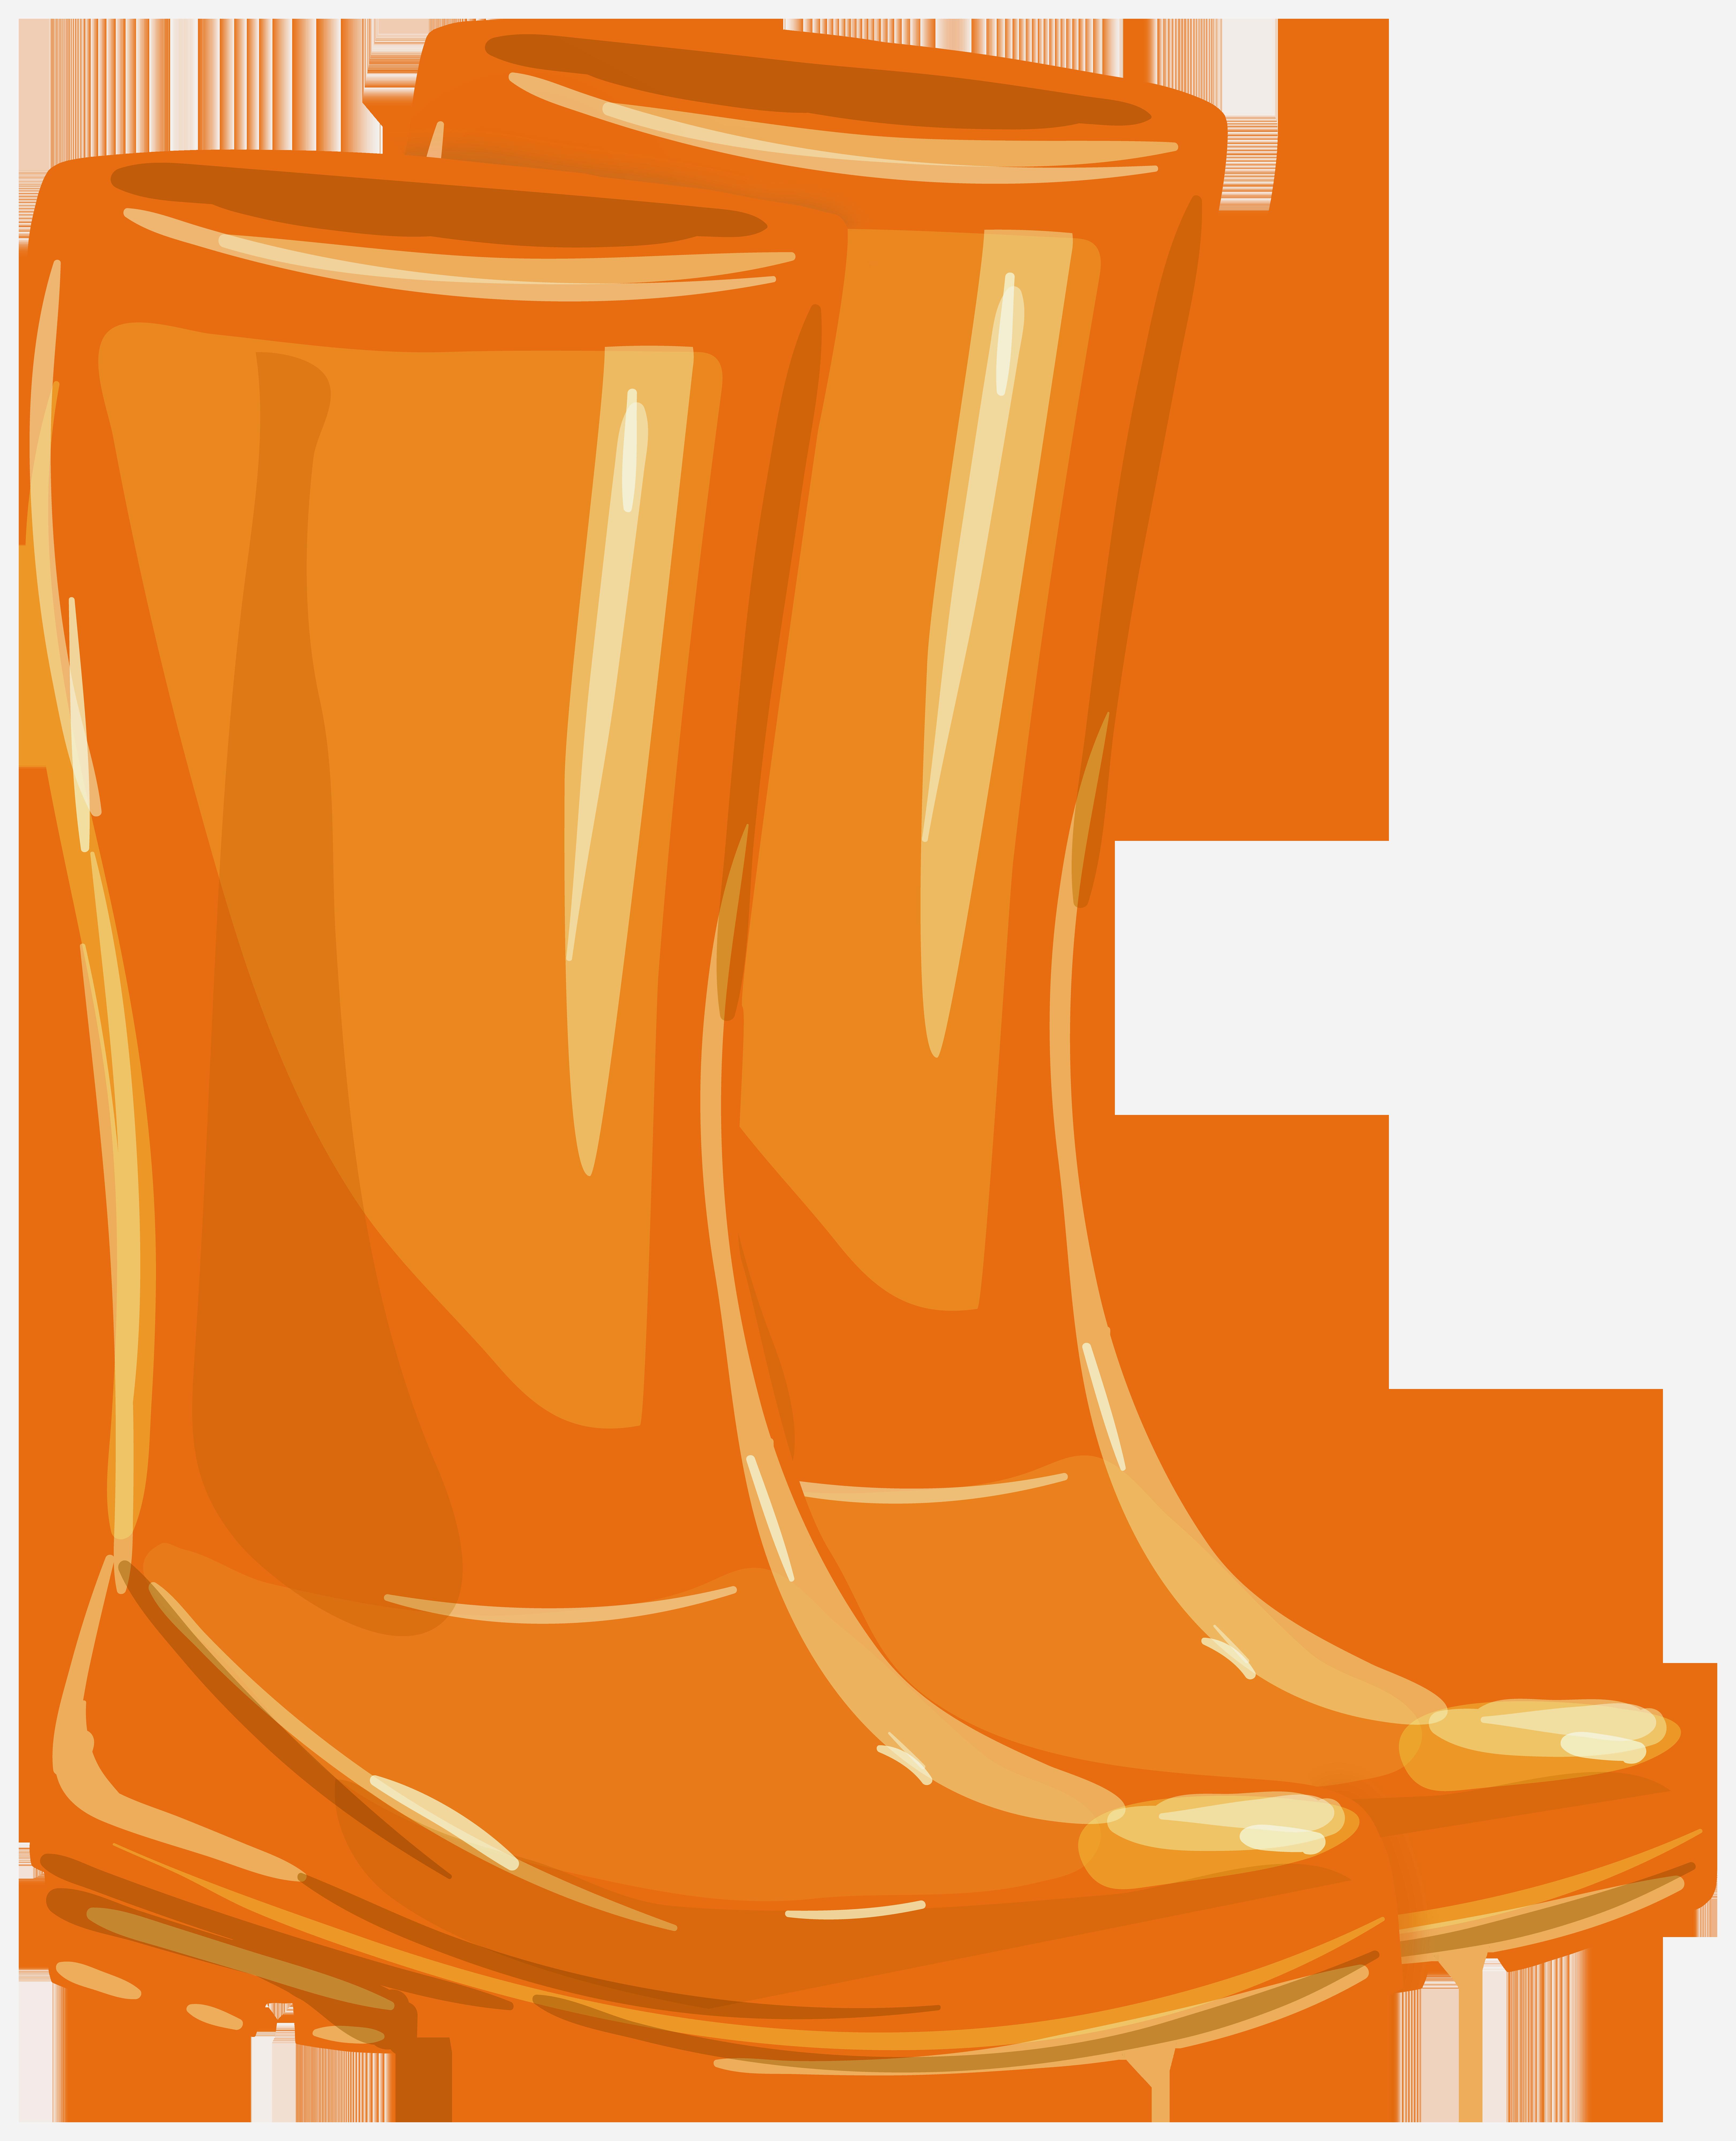 Orange Rubber Boots PNG Clipart.